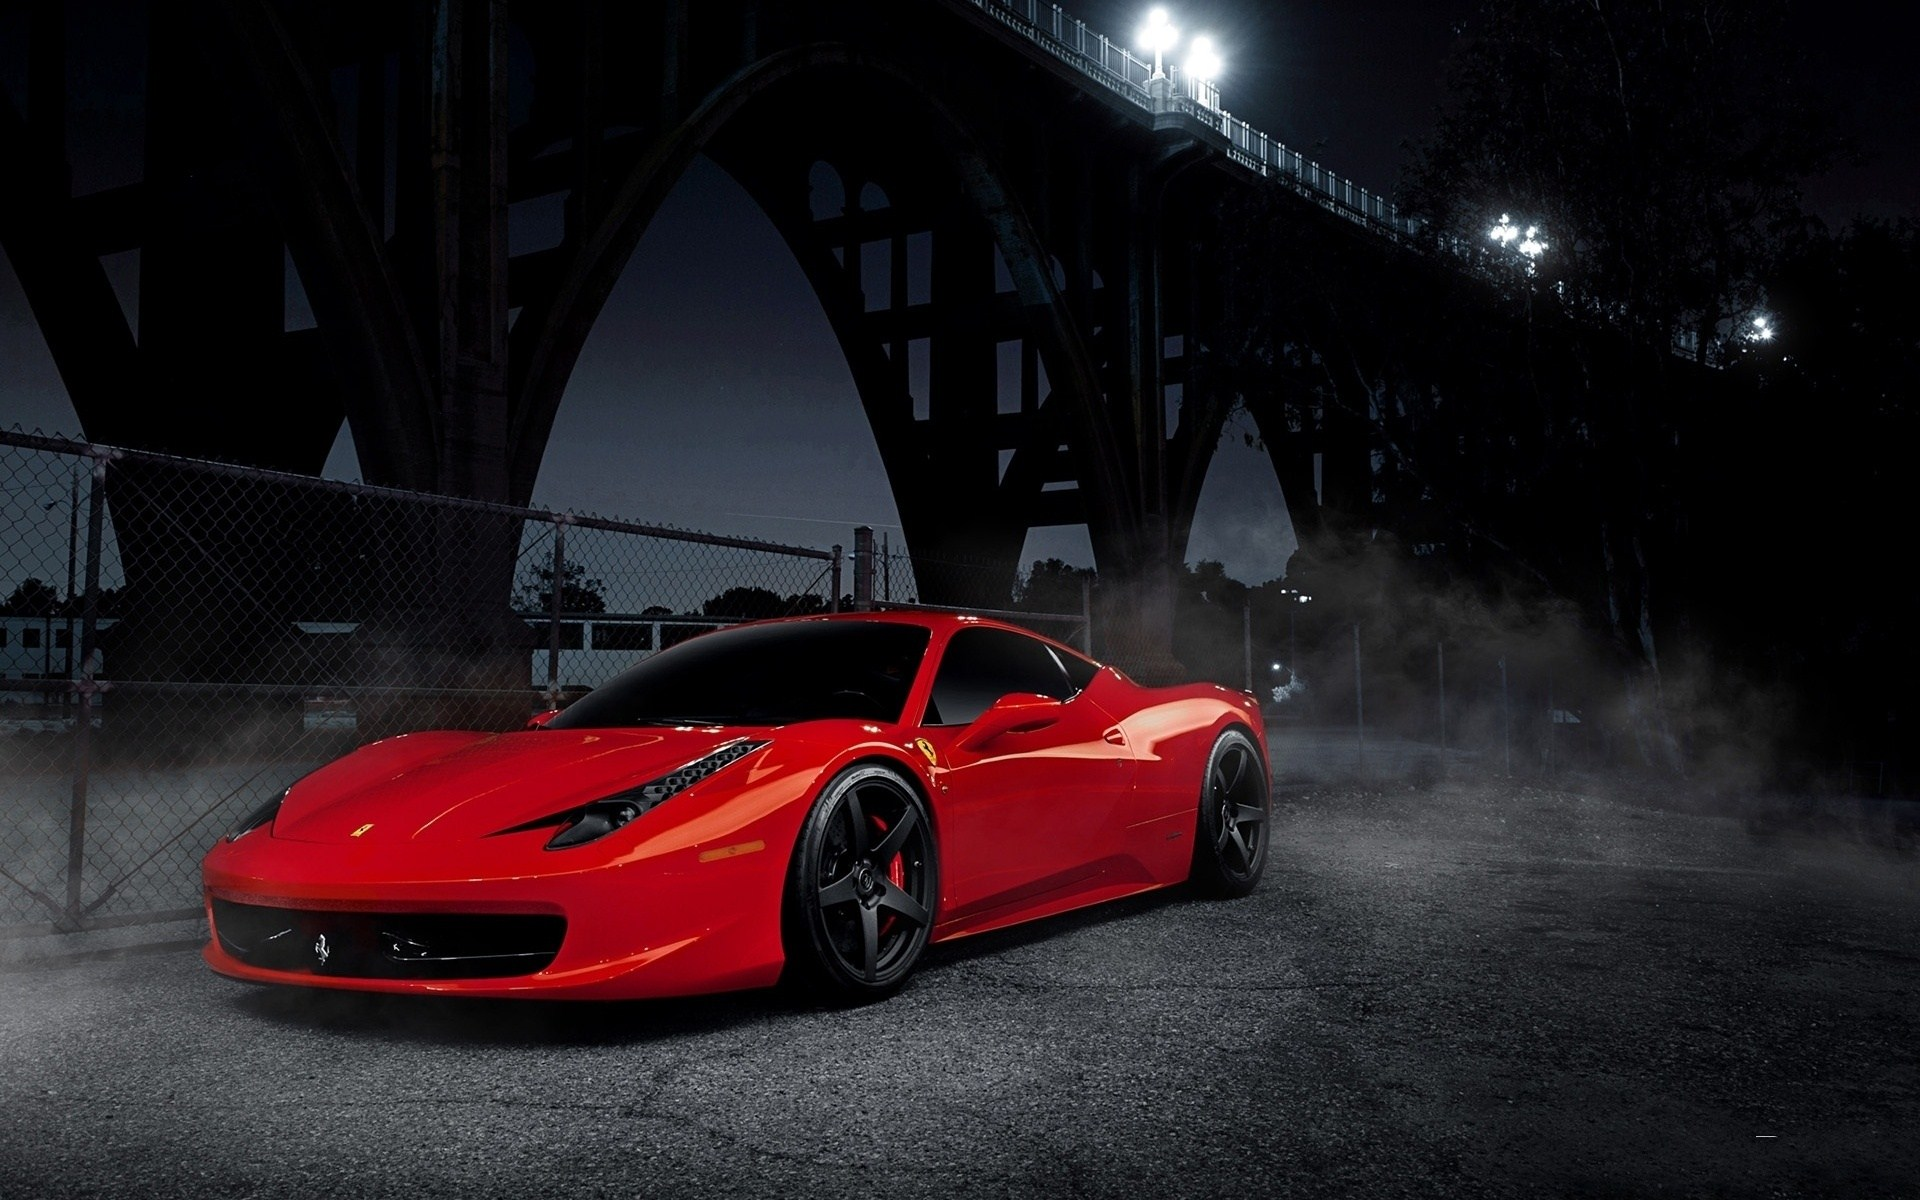 Ferrari 458 Italia Full HD Wallpaper and Background